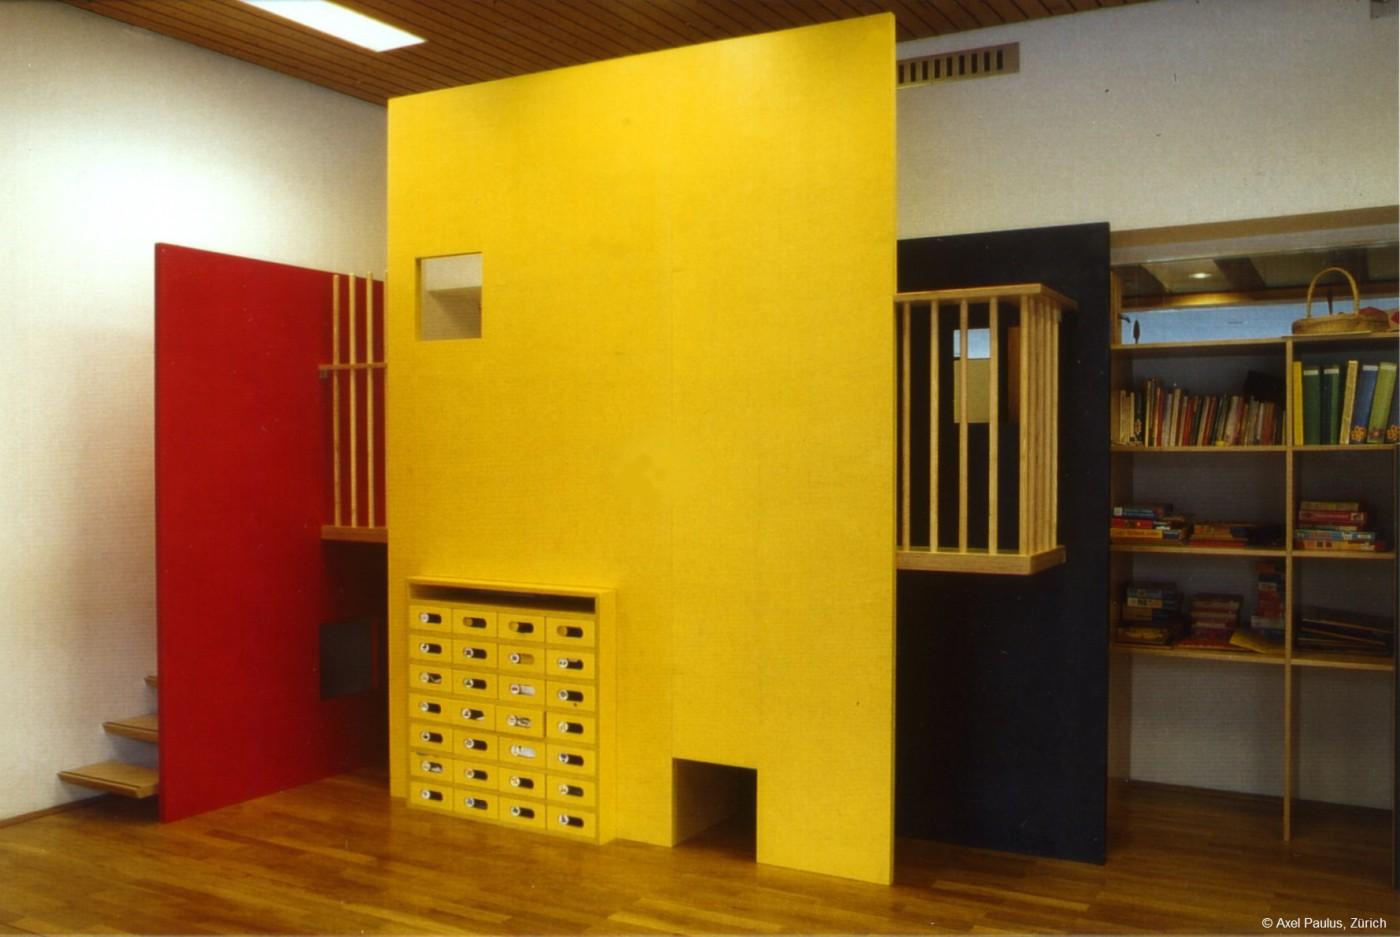 ww_Bildung_Kindergarten_St Albertus Magnus_ Copyright_Axel_Paulus_Zuerich_4c_1400x0_2